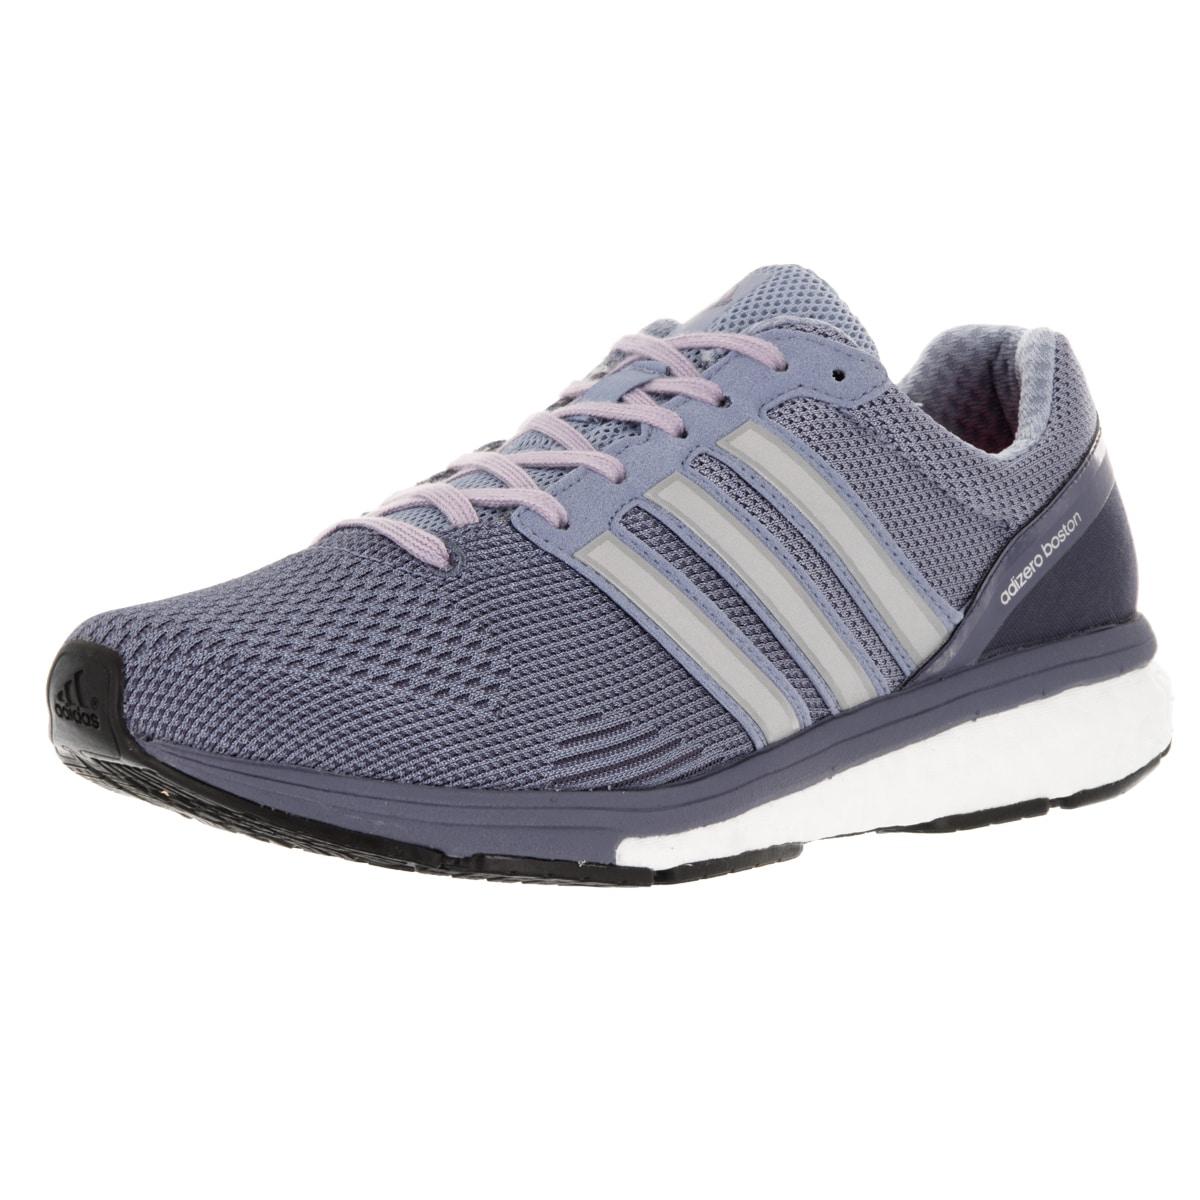 best service 23dc4 0a90e Adidas Womens Adizero Boston 5 Tsf W Purple Running Shoe